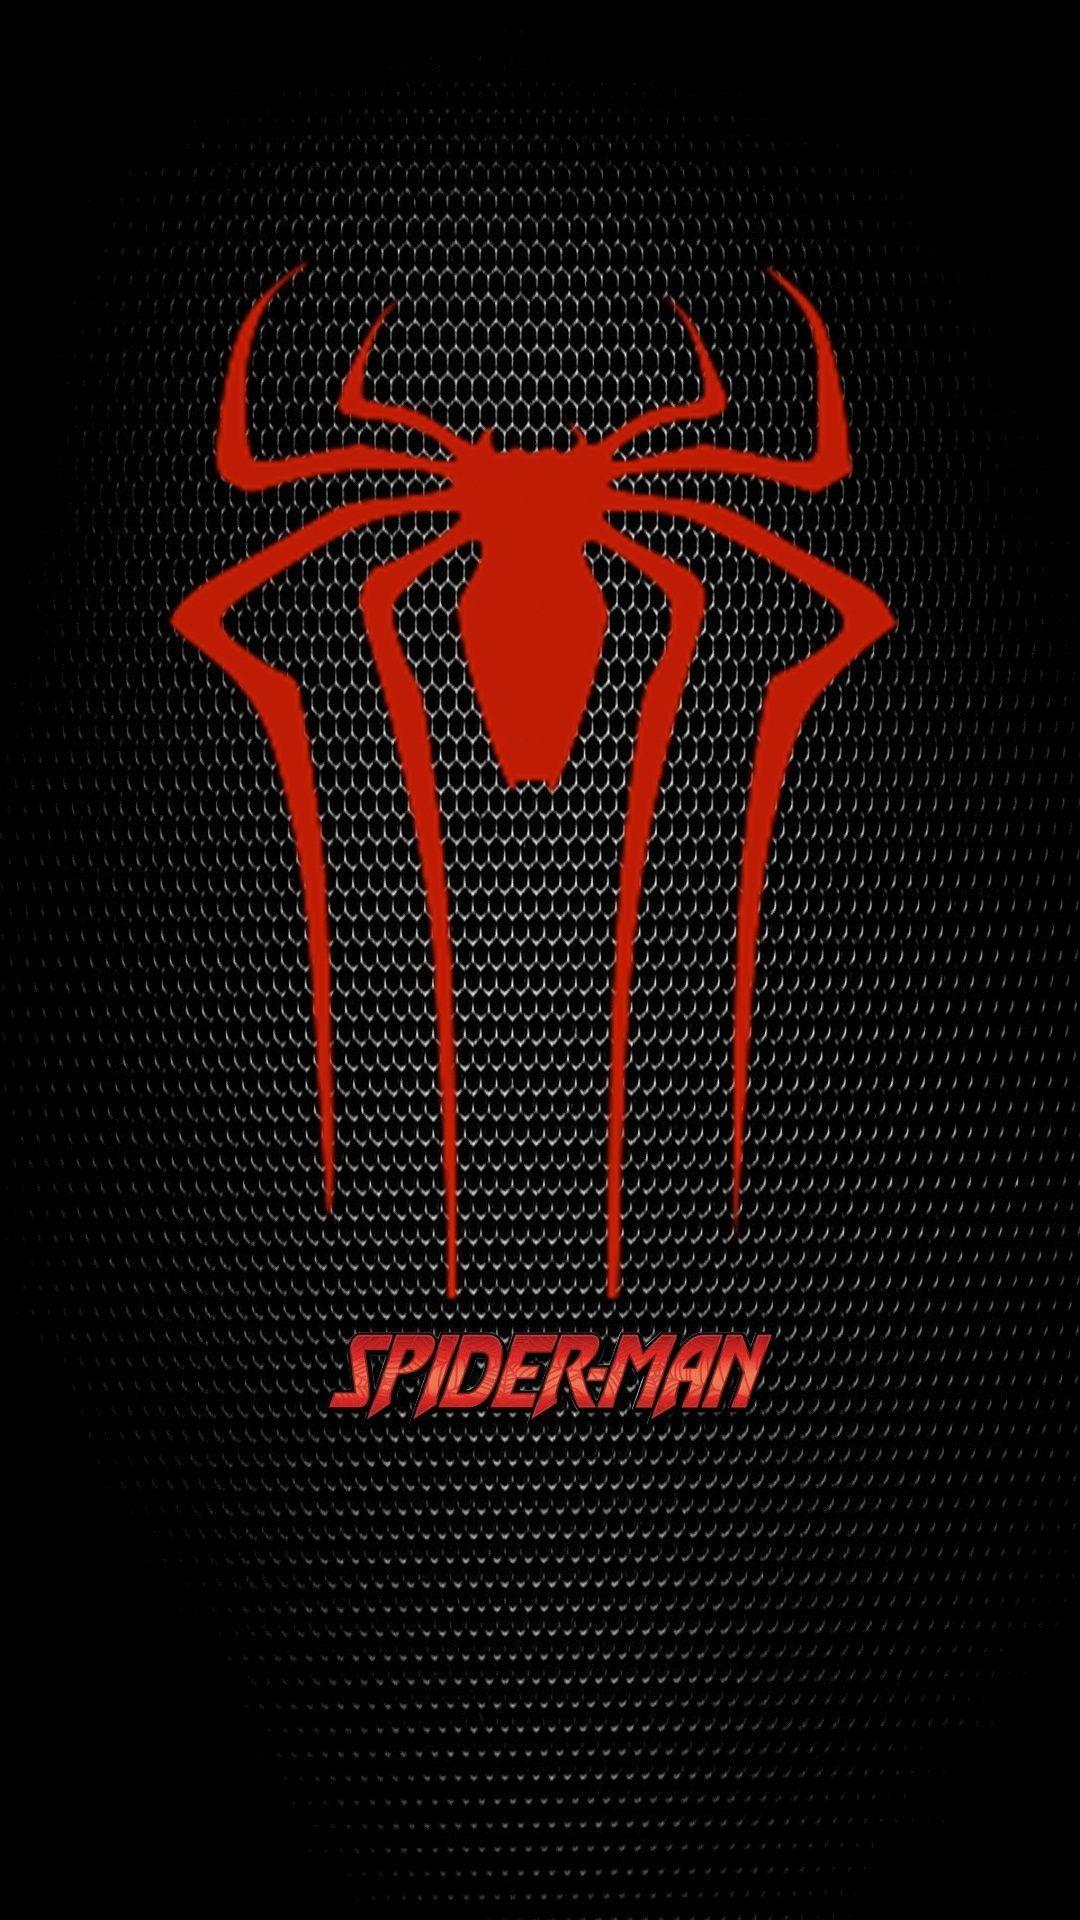 Logos Spiderman Iphone 6 Plus Wallpapers Logo Spiderma Iphone 6